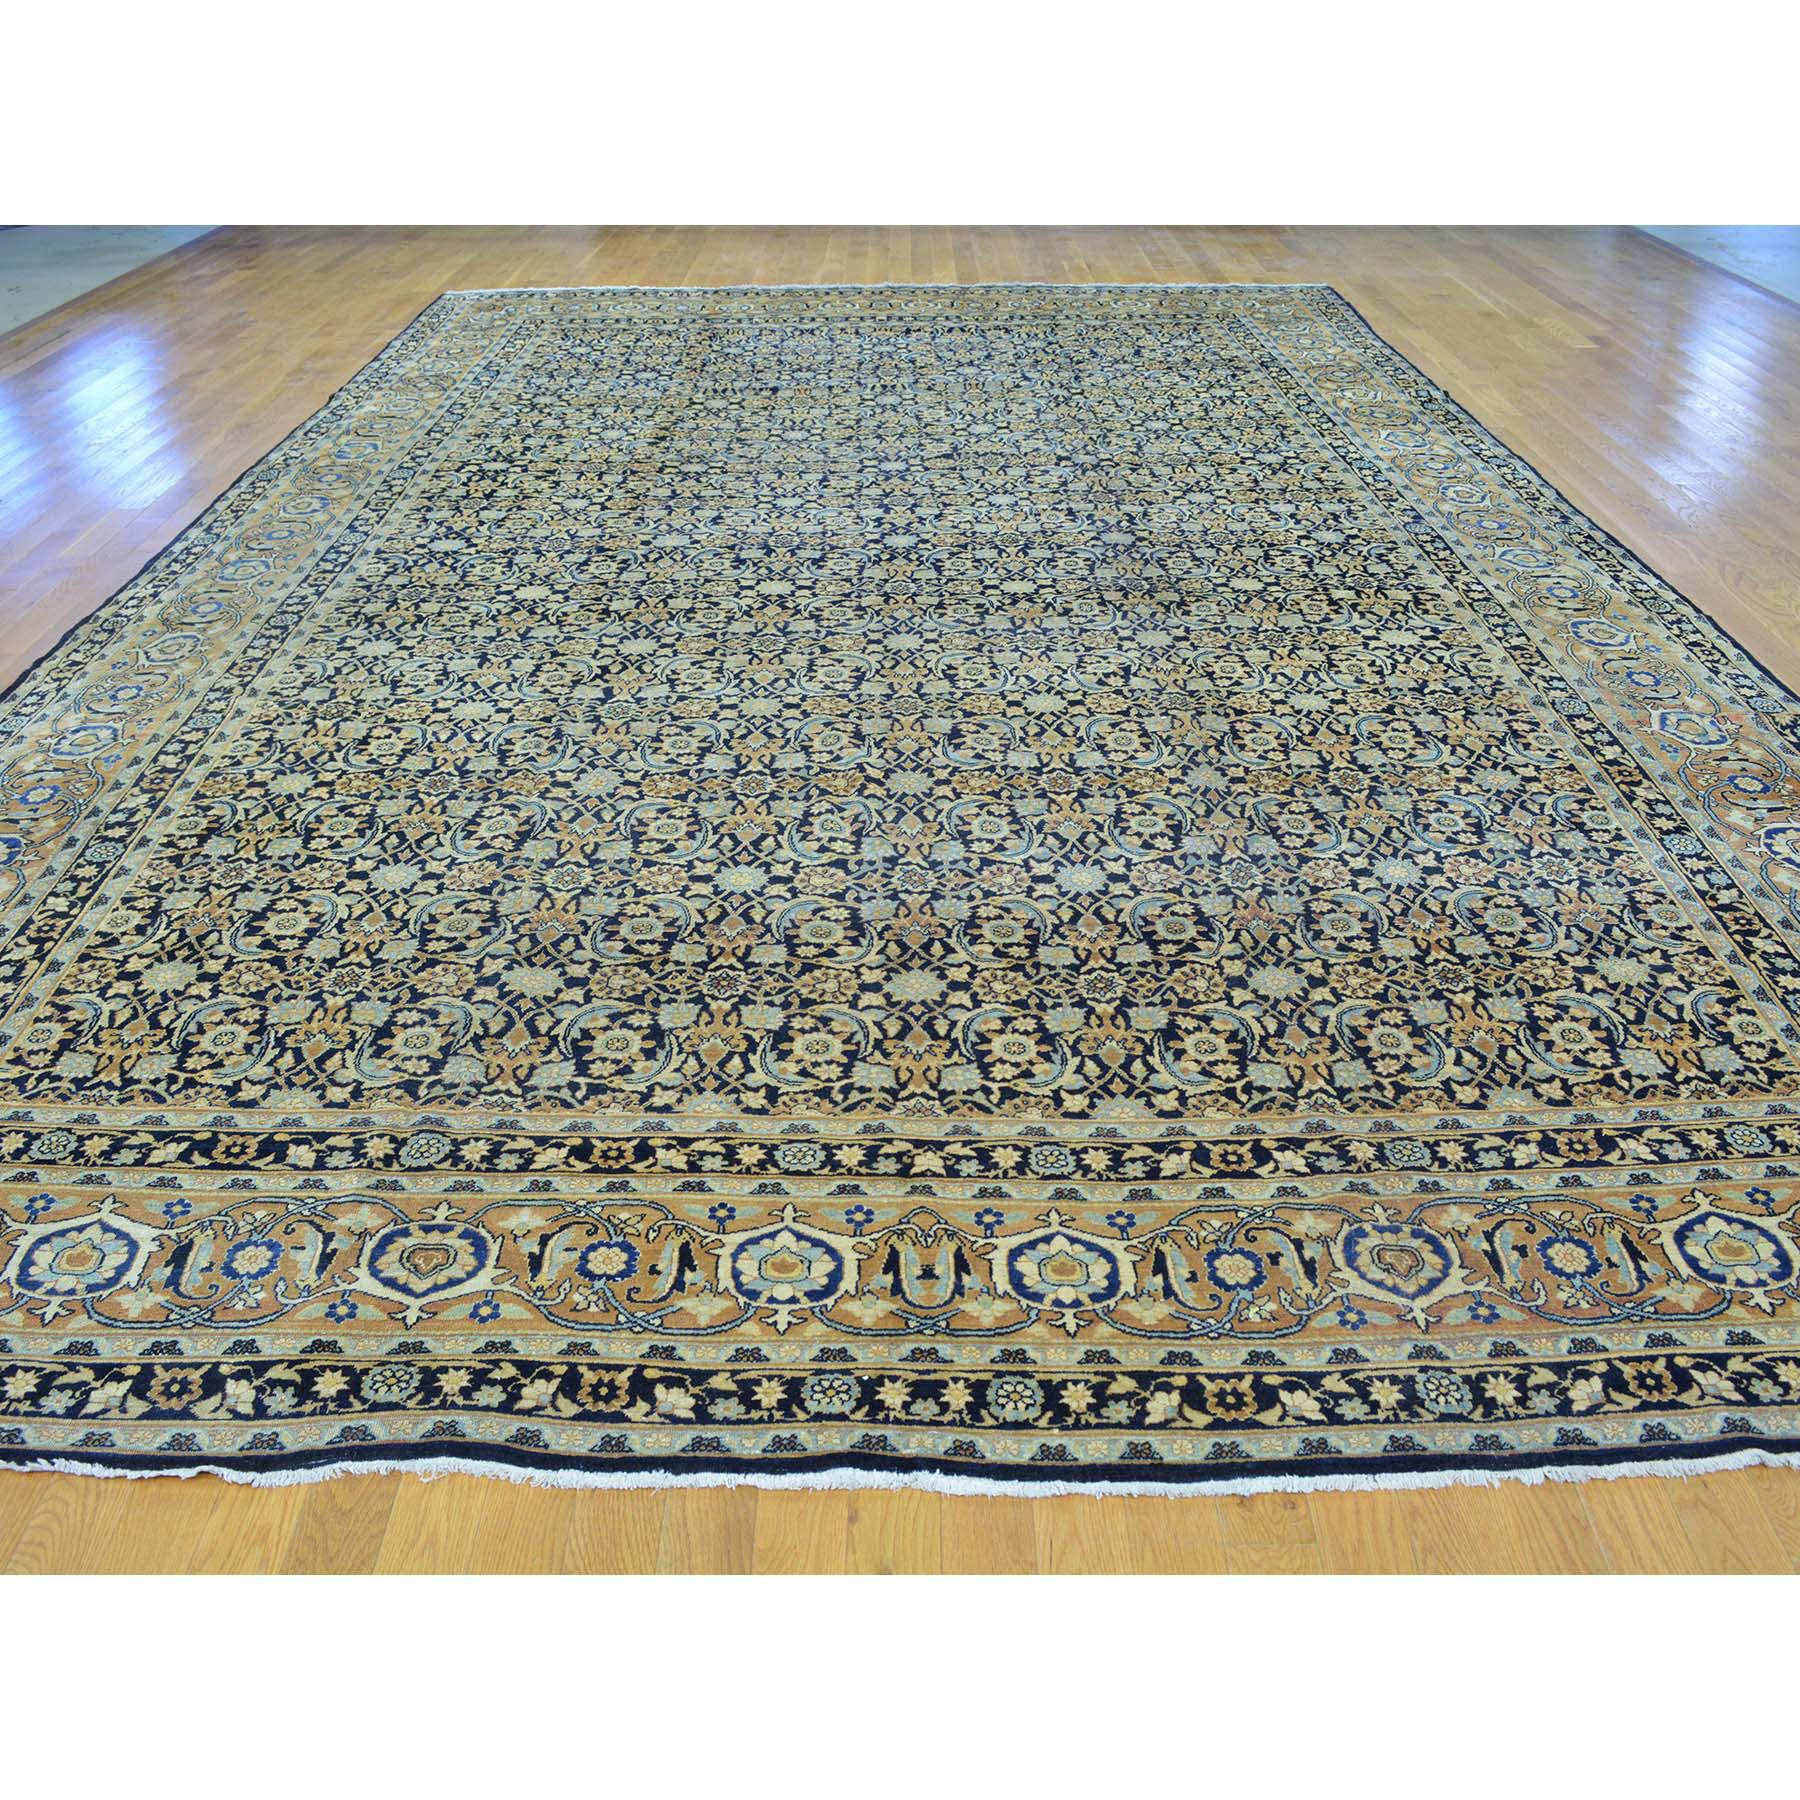 10-10 x17- Gallery Size Antique Persian Kerman Herati Design Rug